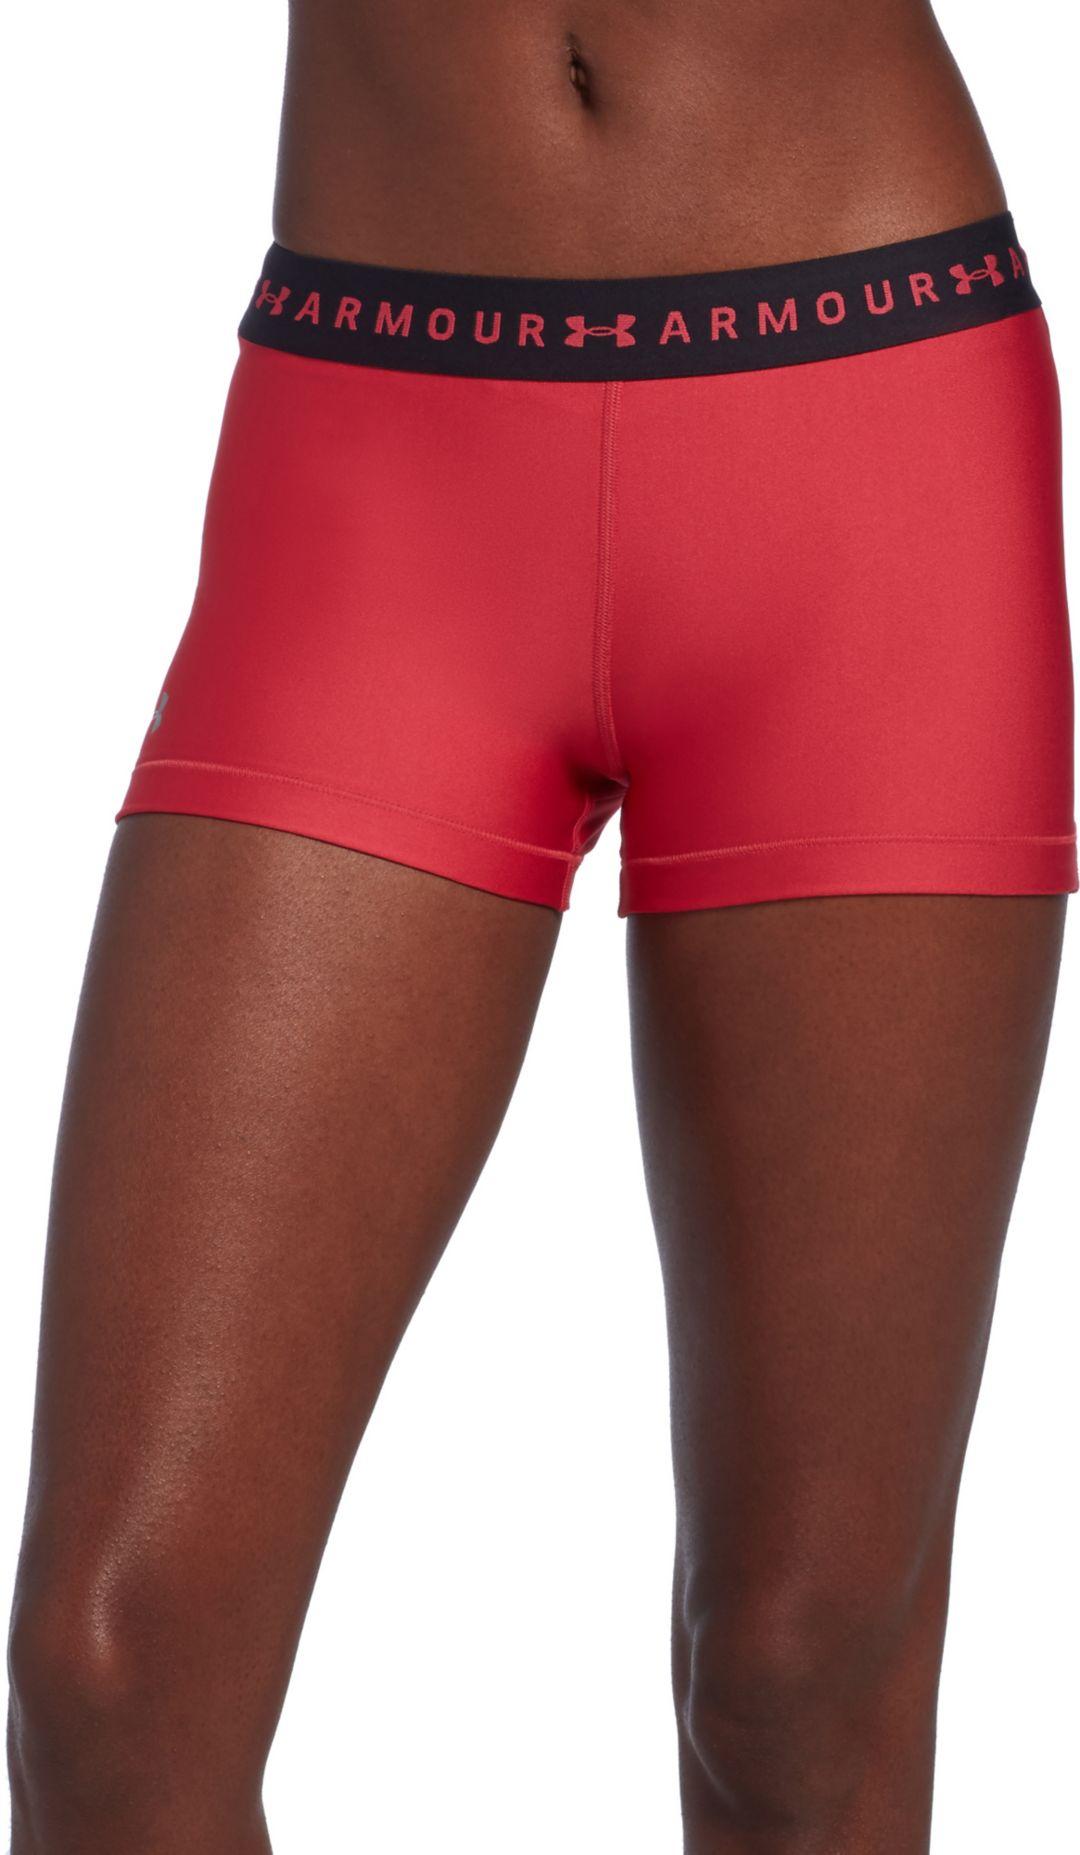 56cdf8cde6 Under Armour Women's HeatGear Armour Shorty Shorts